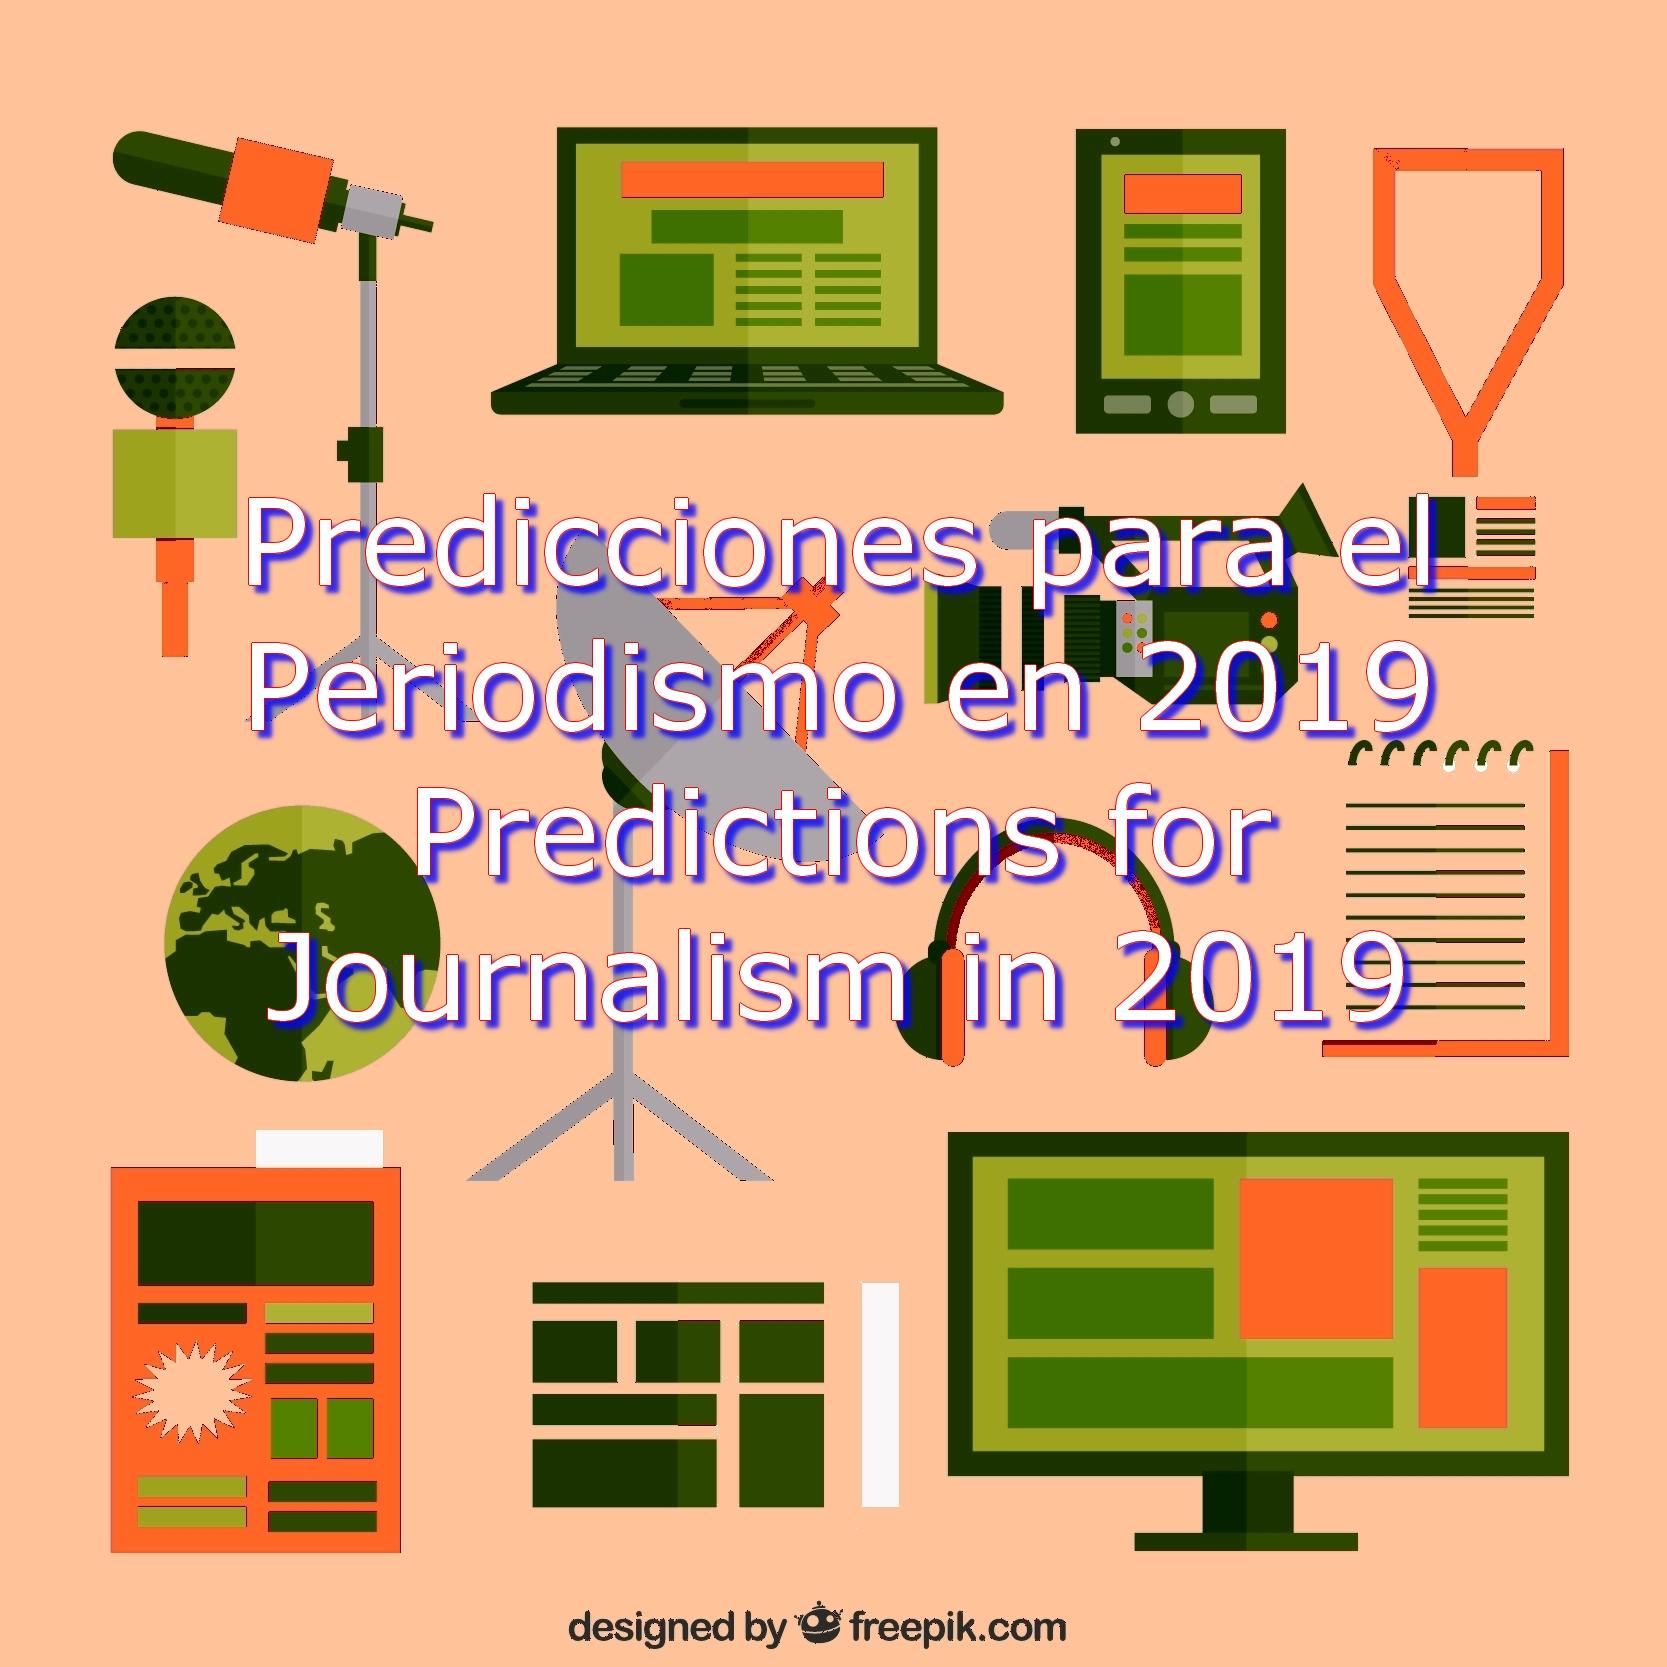 Predicciones para el Periodismo en 2019 . Predictions for Journalism in 2019 d9c6947e1c16e